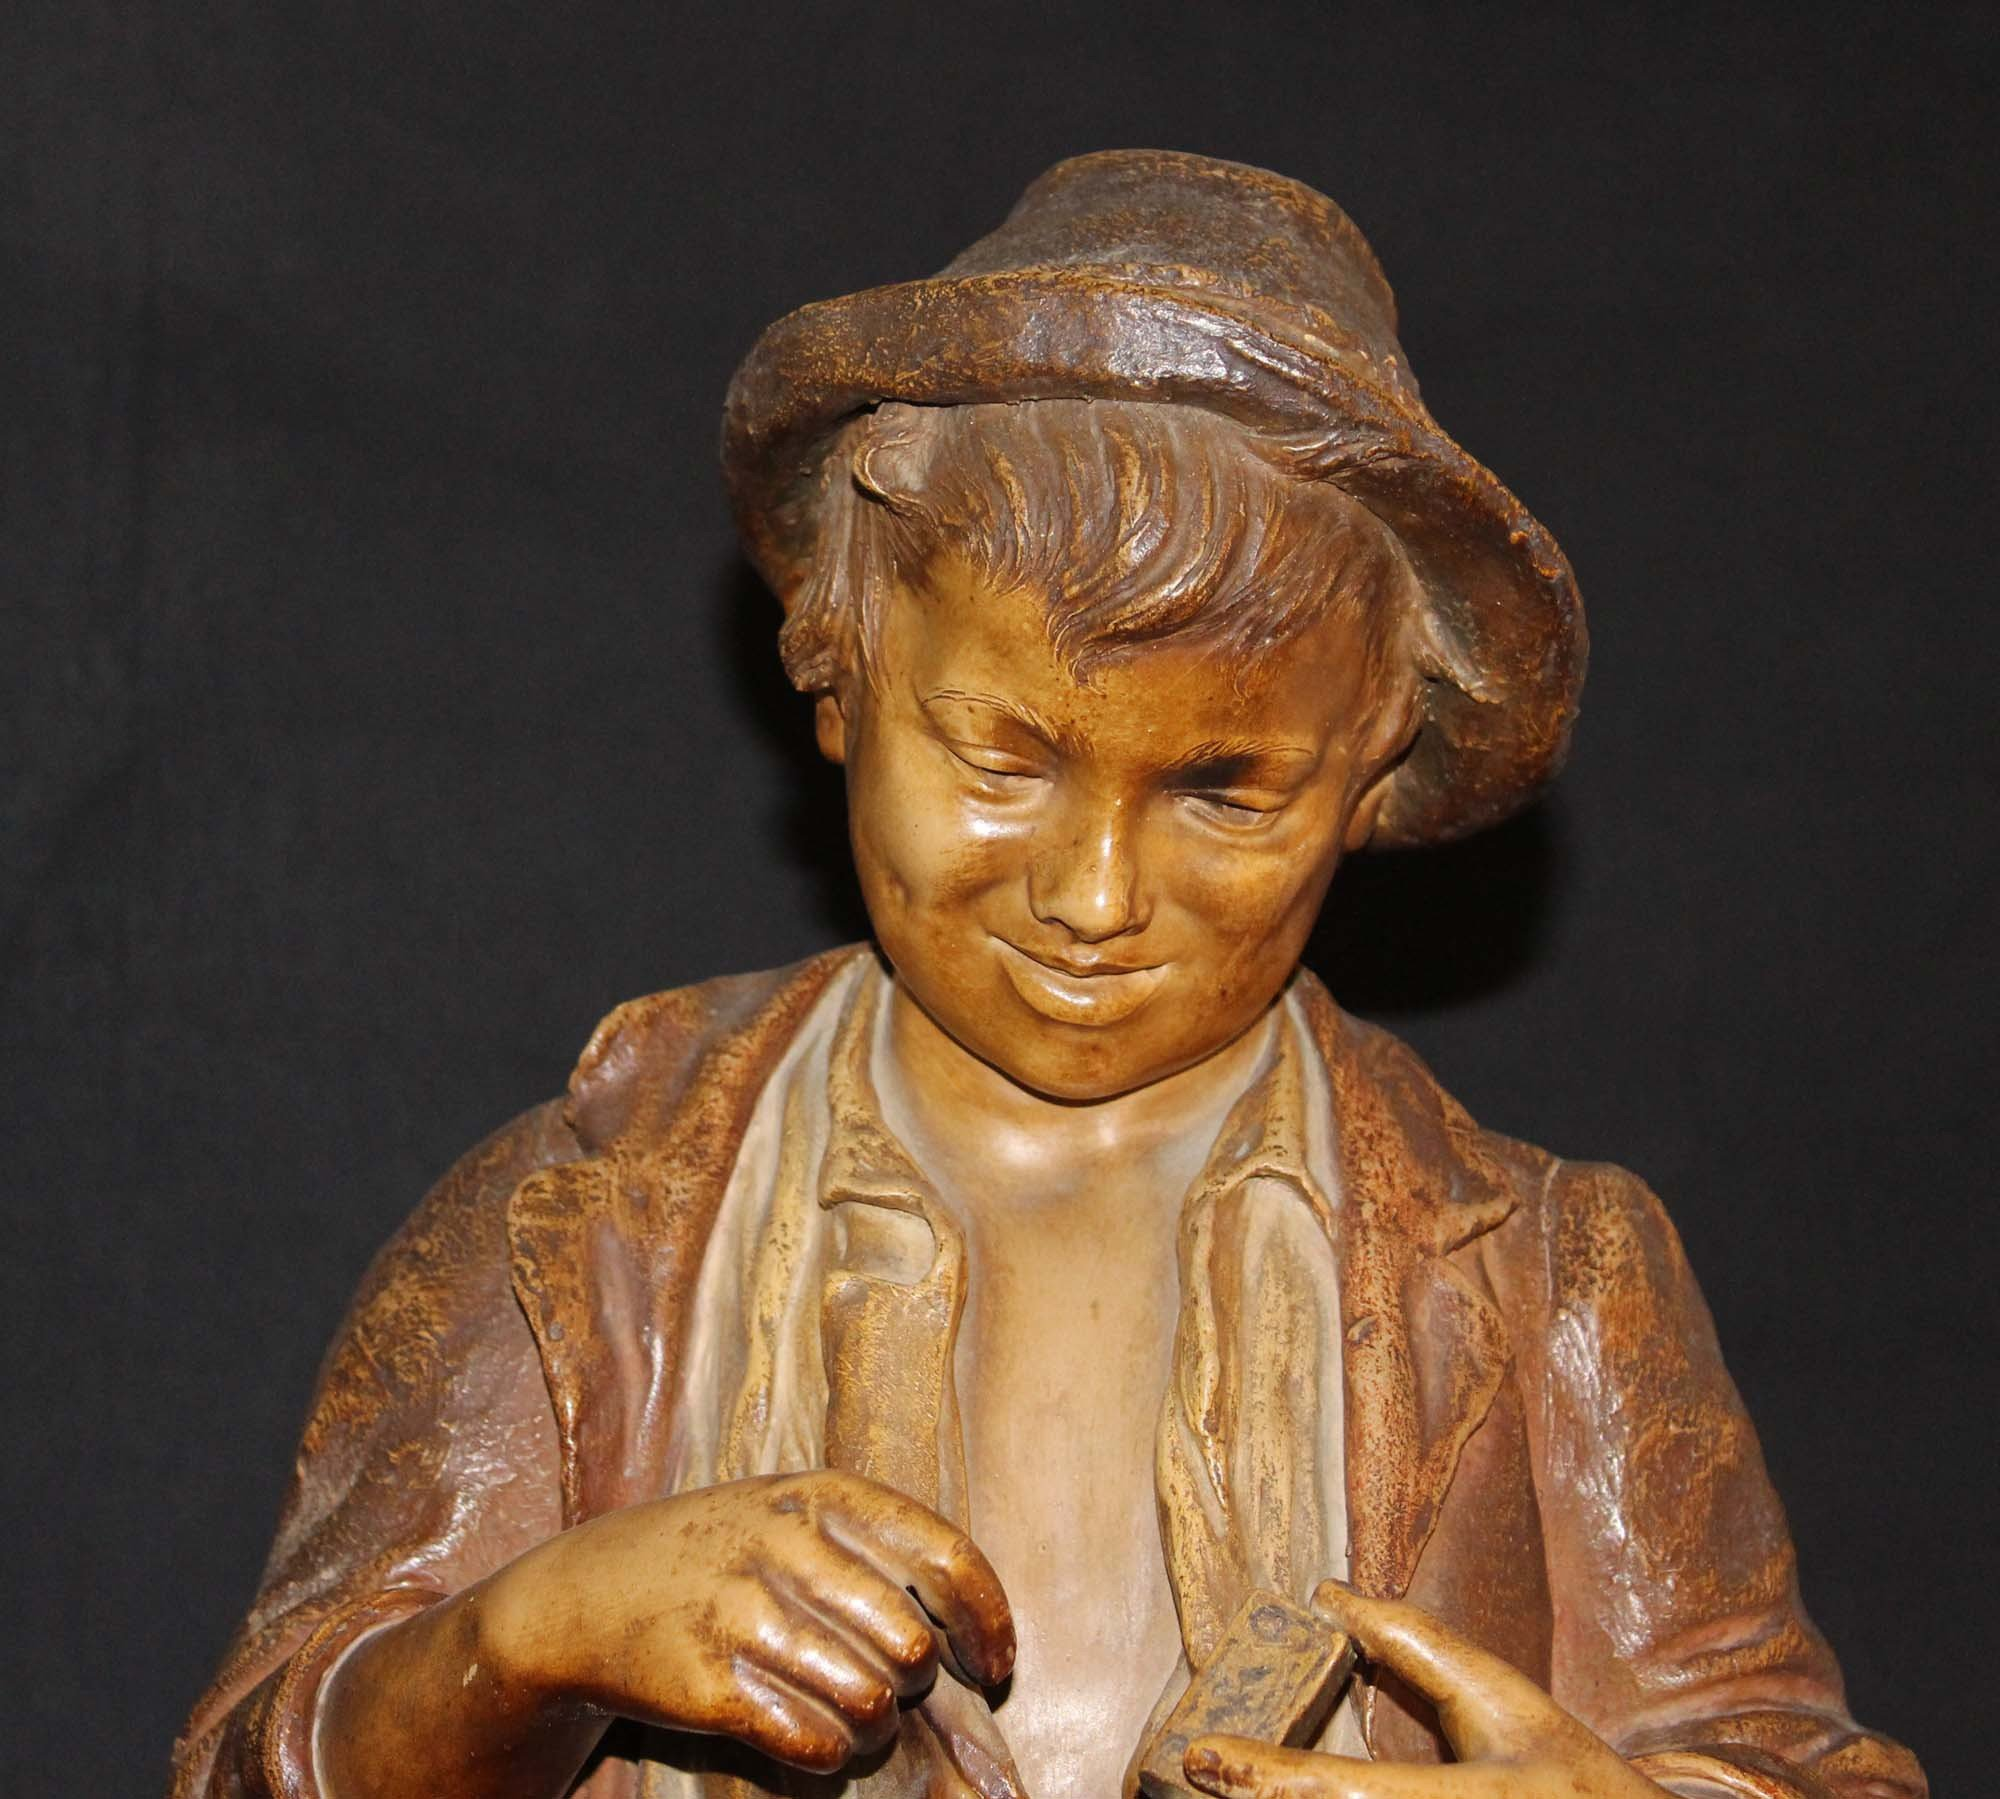 galerie-bosetti-antiquites, sculpture terre cuite GOLDSCHEIDER tête